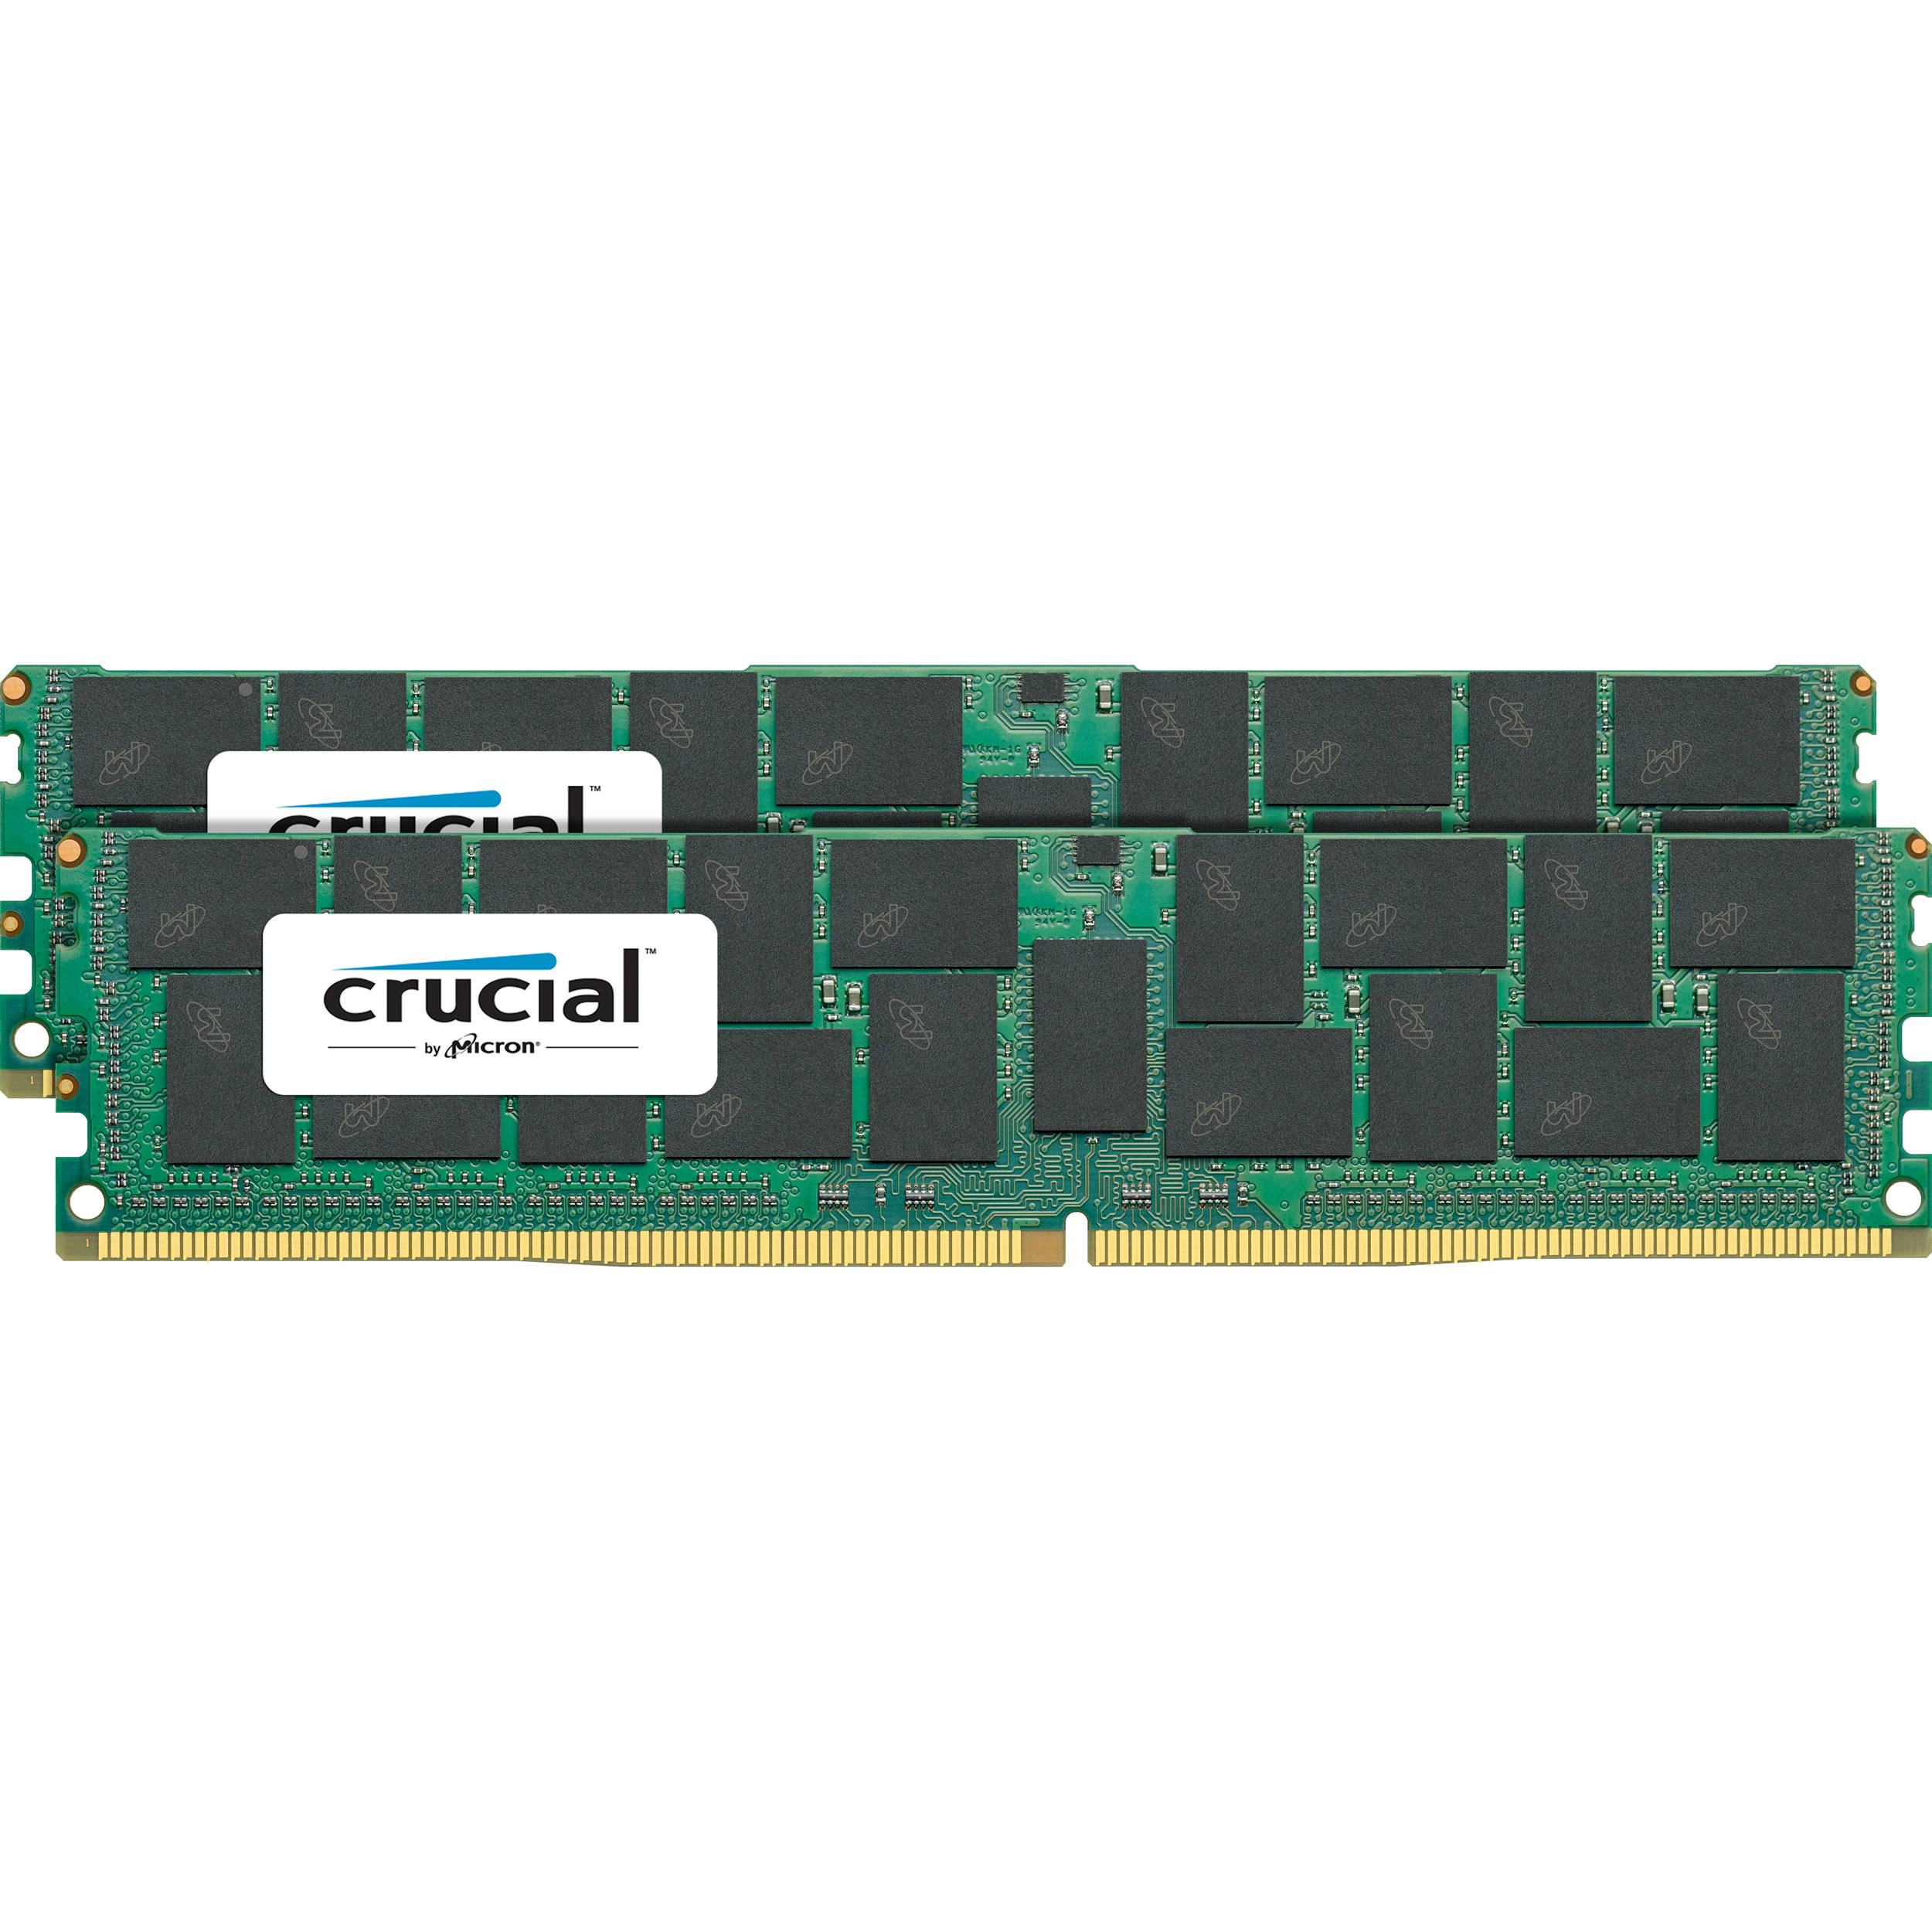 Crucial 128GB DDR4 2400 MHz LR-DIMM Memory Kit CT2K64G4LFQ424A